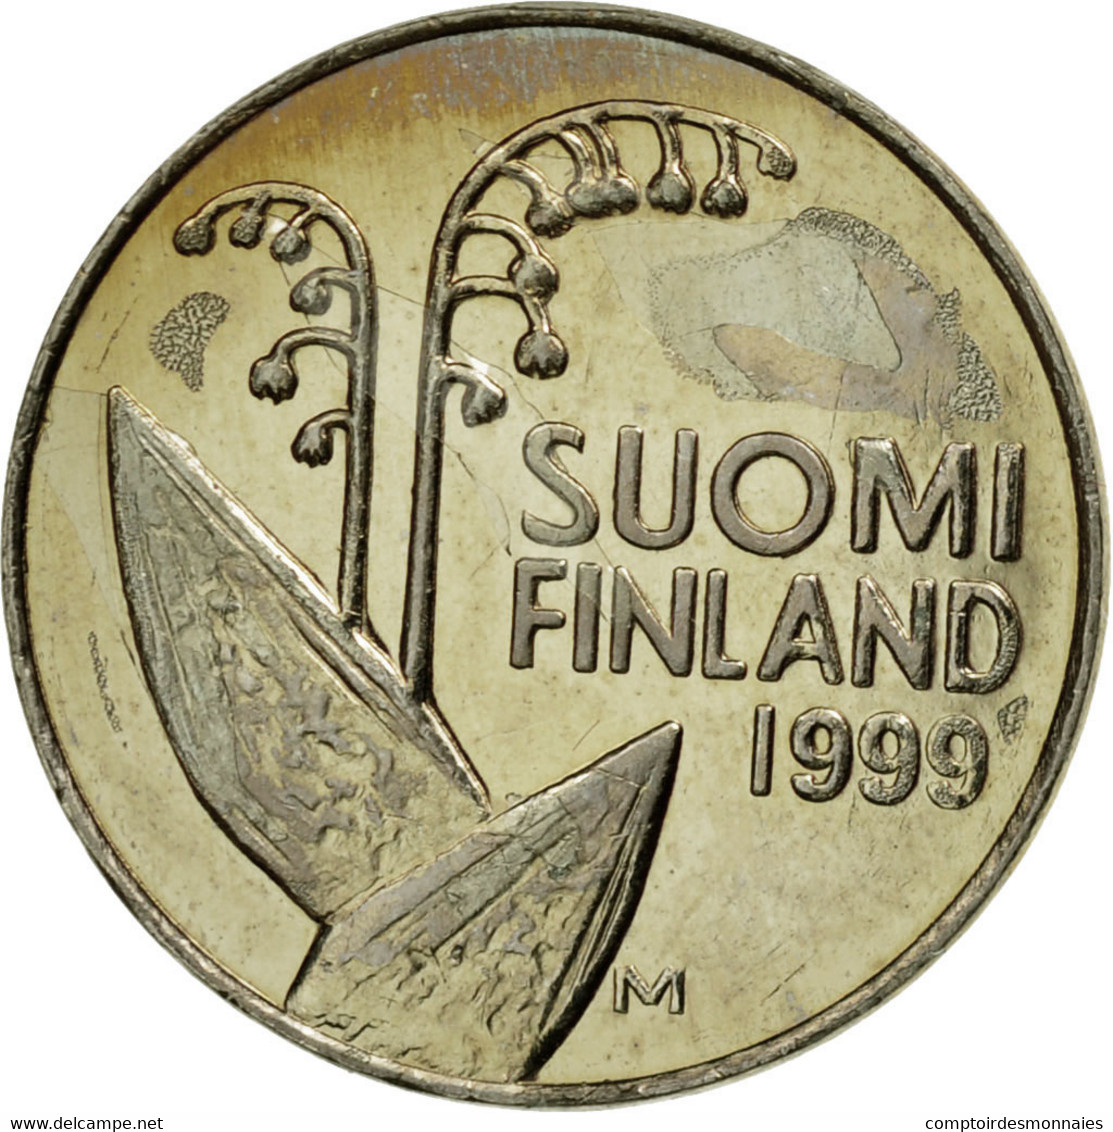 Monnaie, Finlande, 10 Pennia, 1999, TTB, Copper-nickel, KM:65 - Finlande